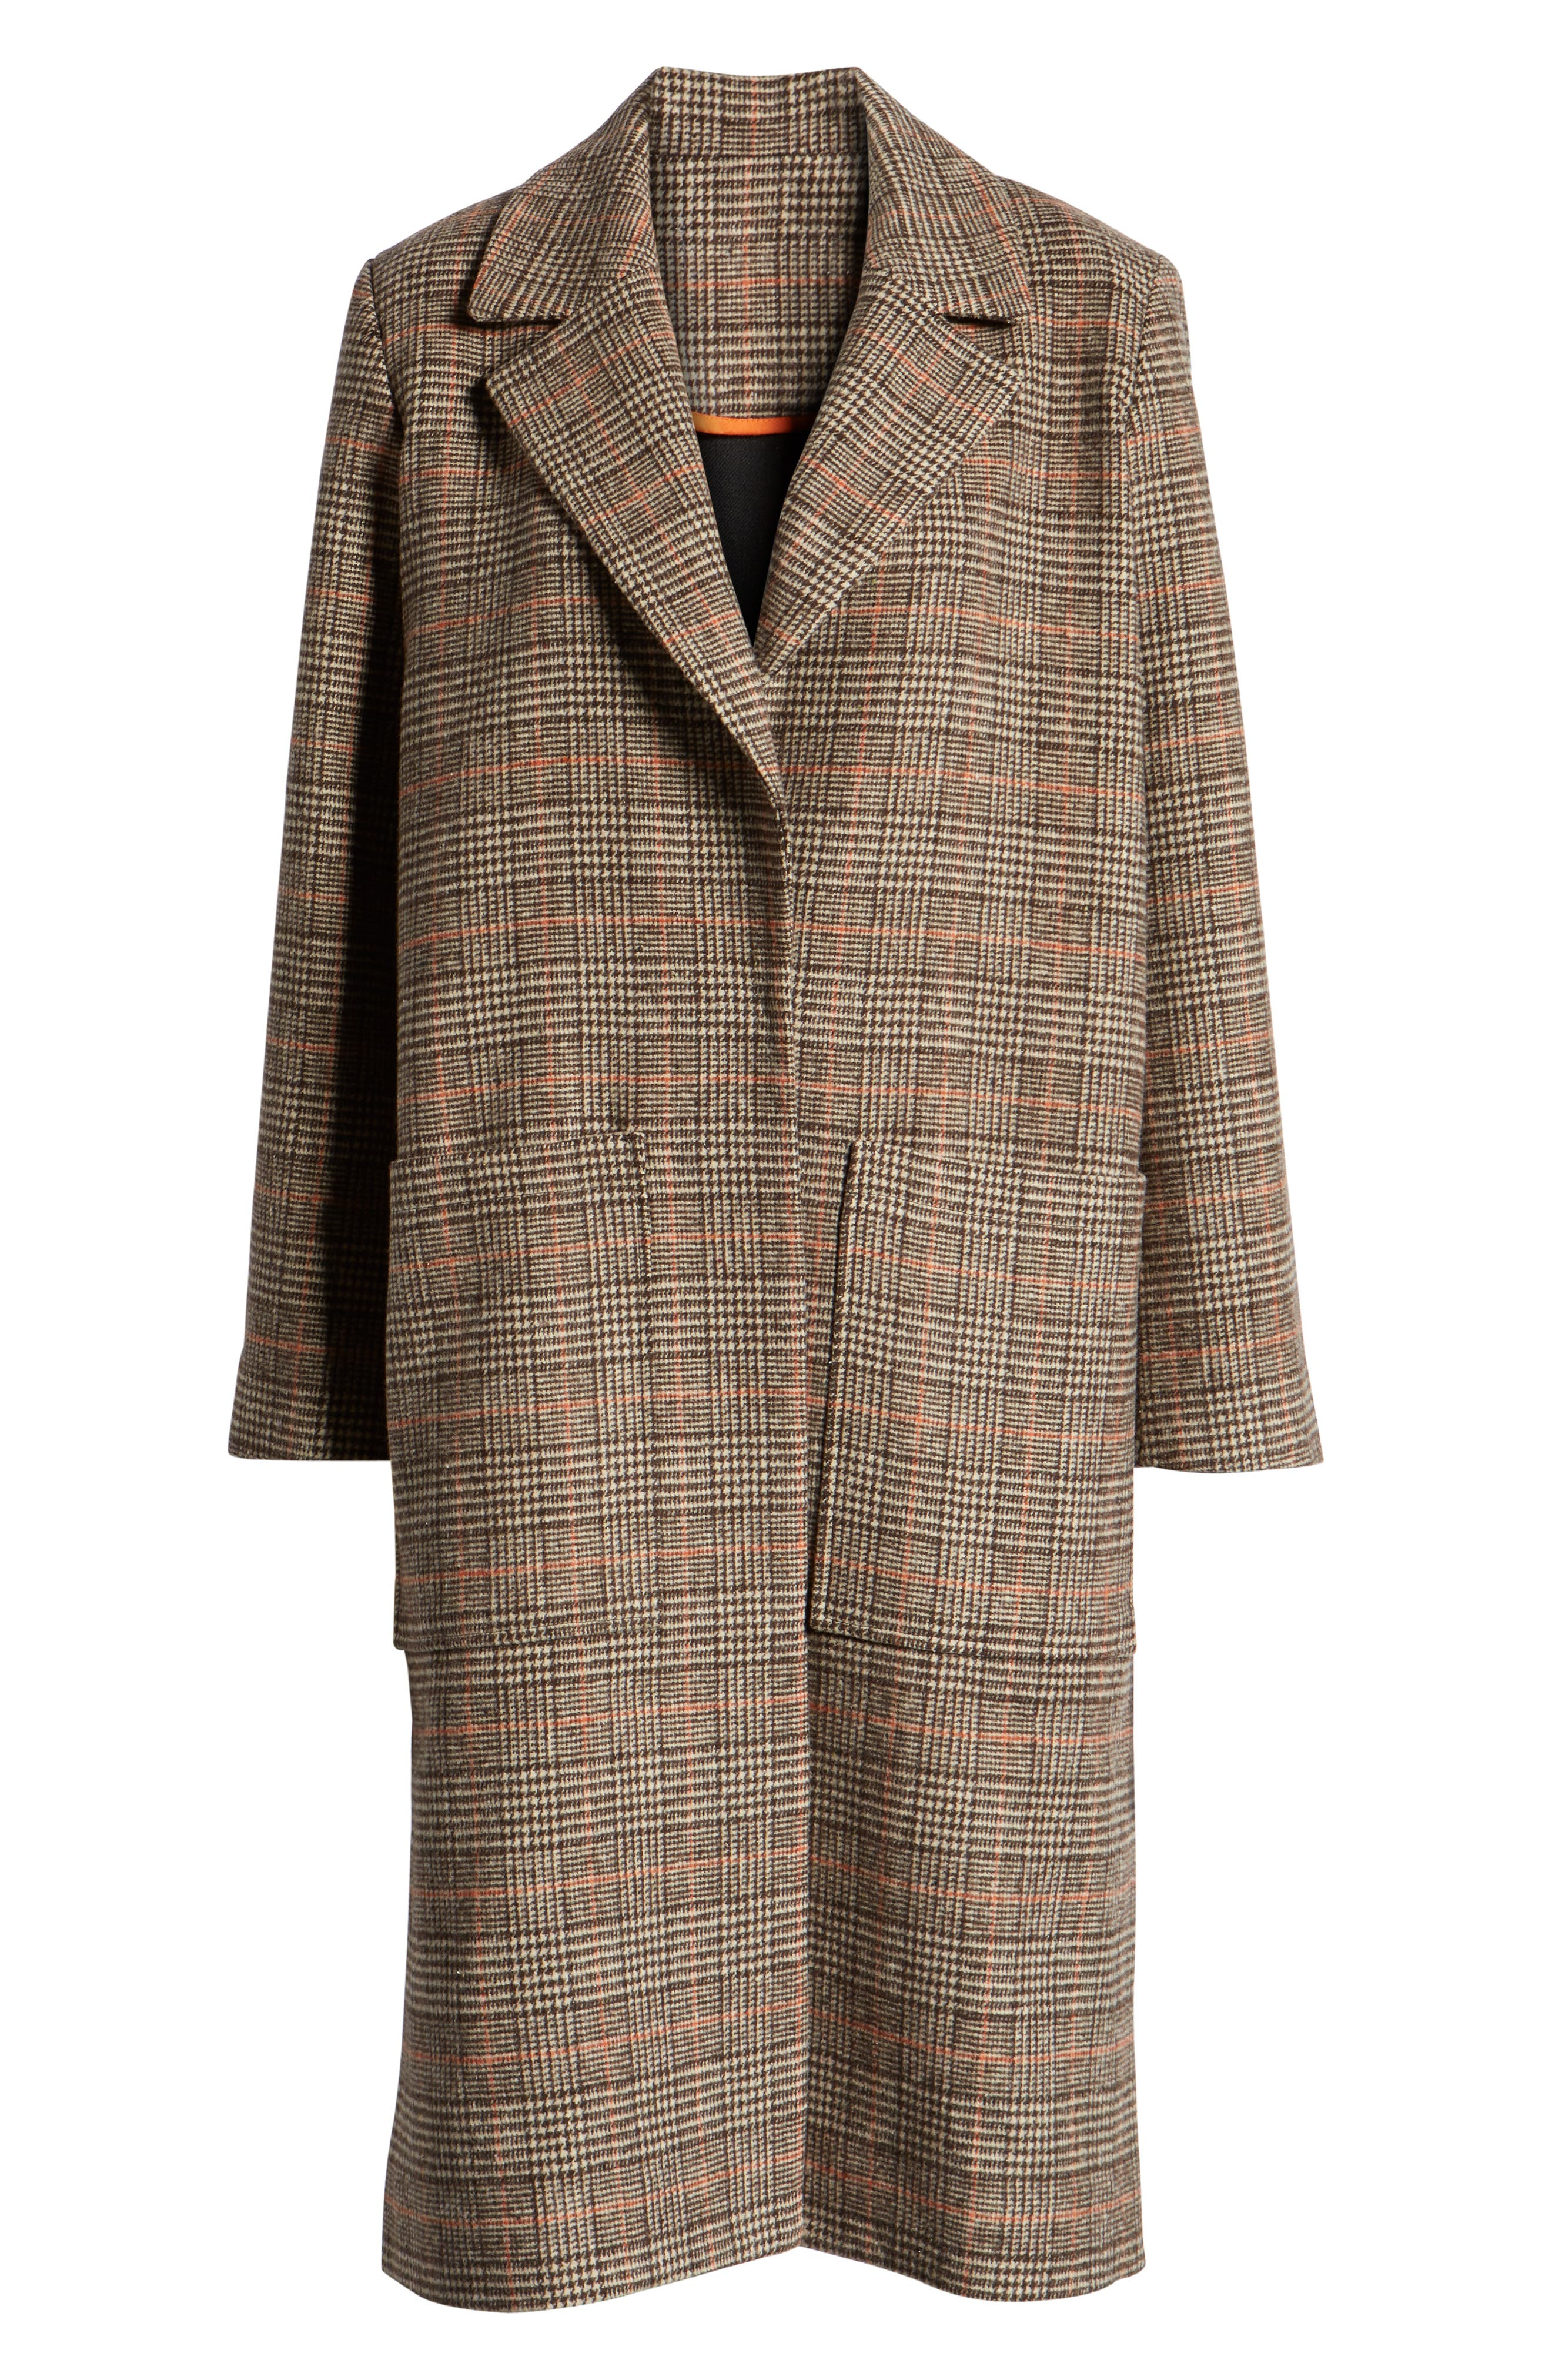 SOMETHING NAVY,                             Patch Pocket Plaid Coat,                             Alternate thumbnail 6, color,                             210